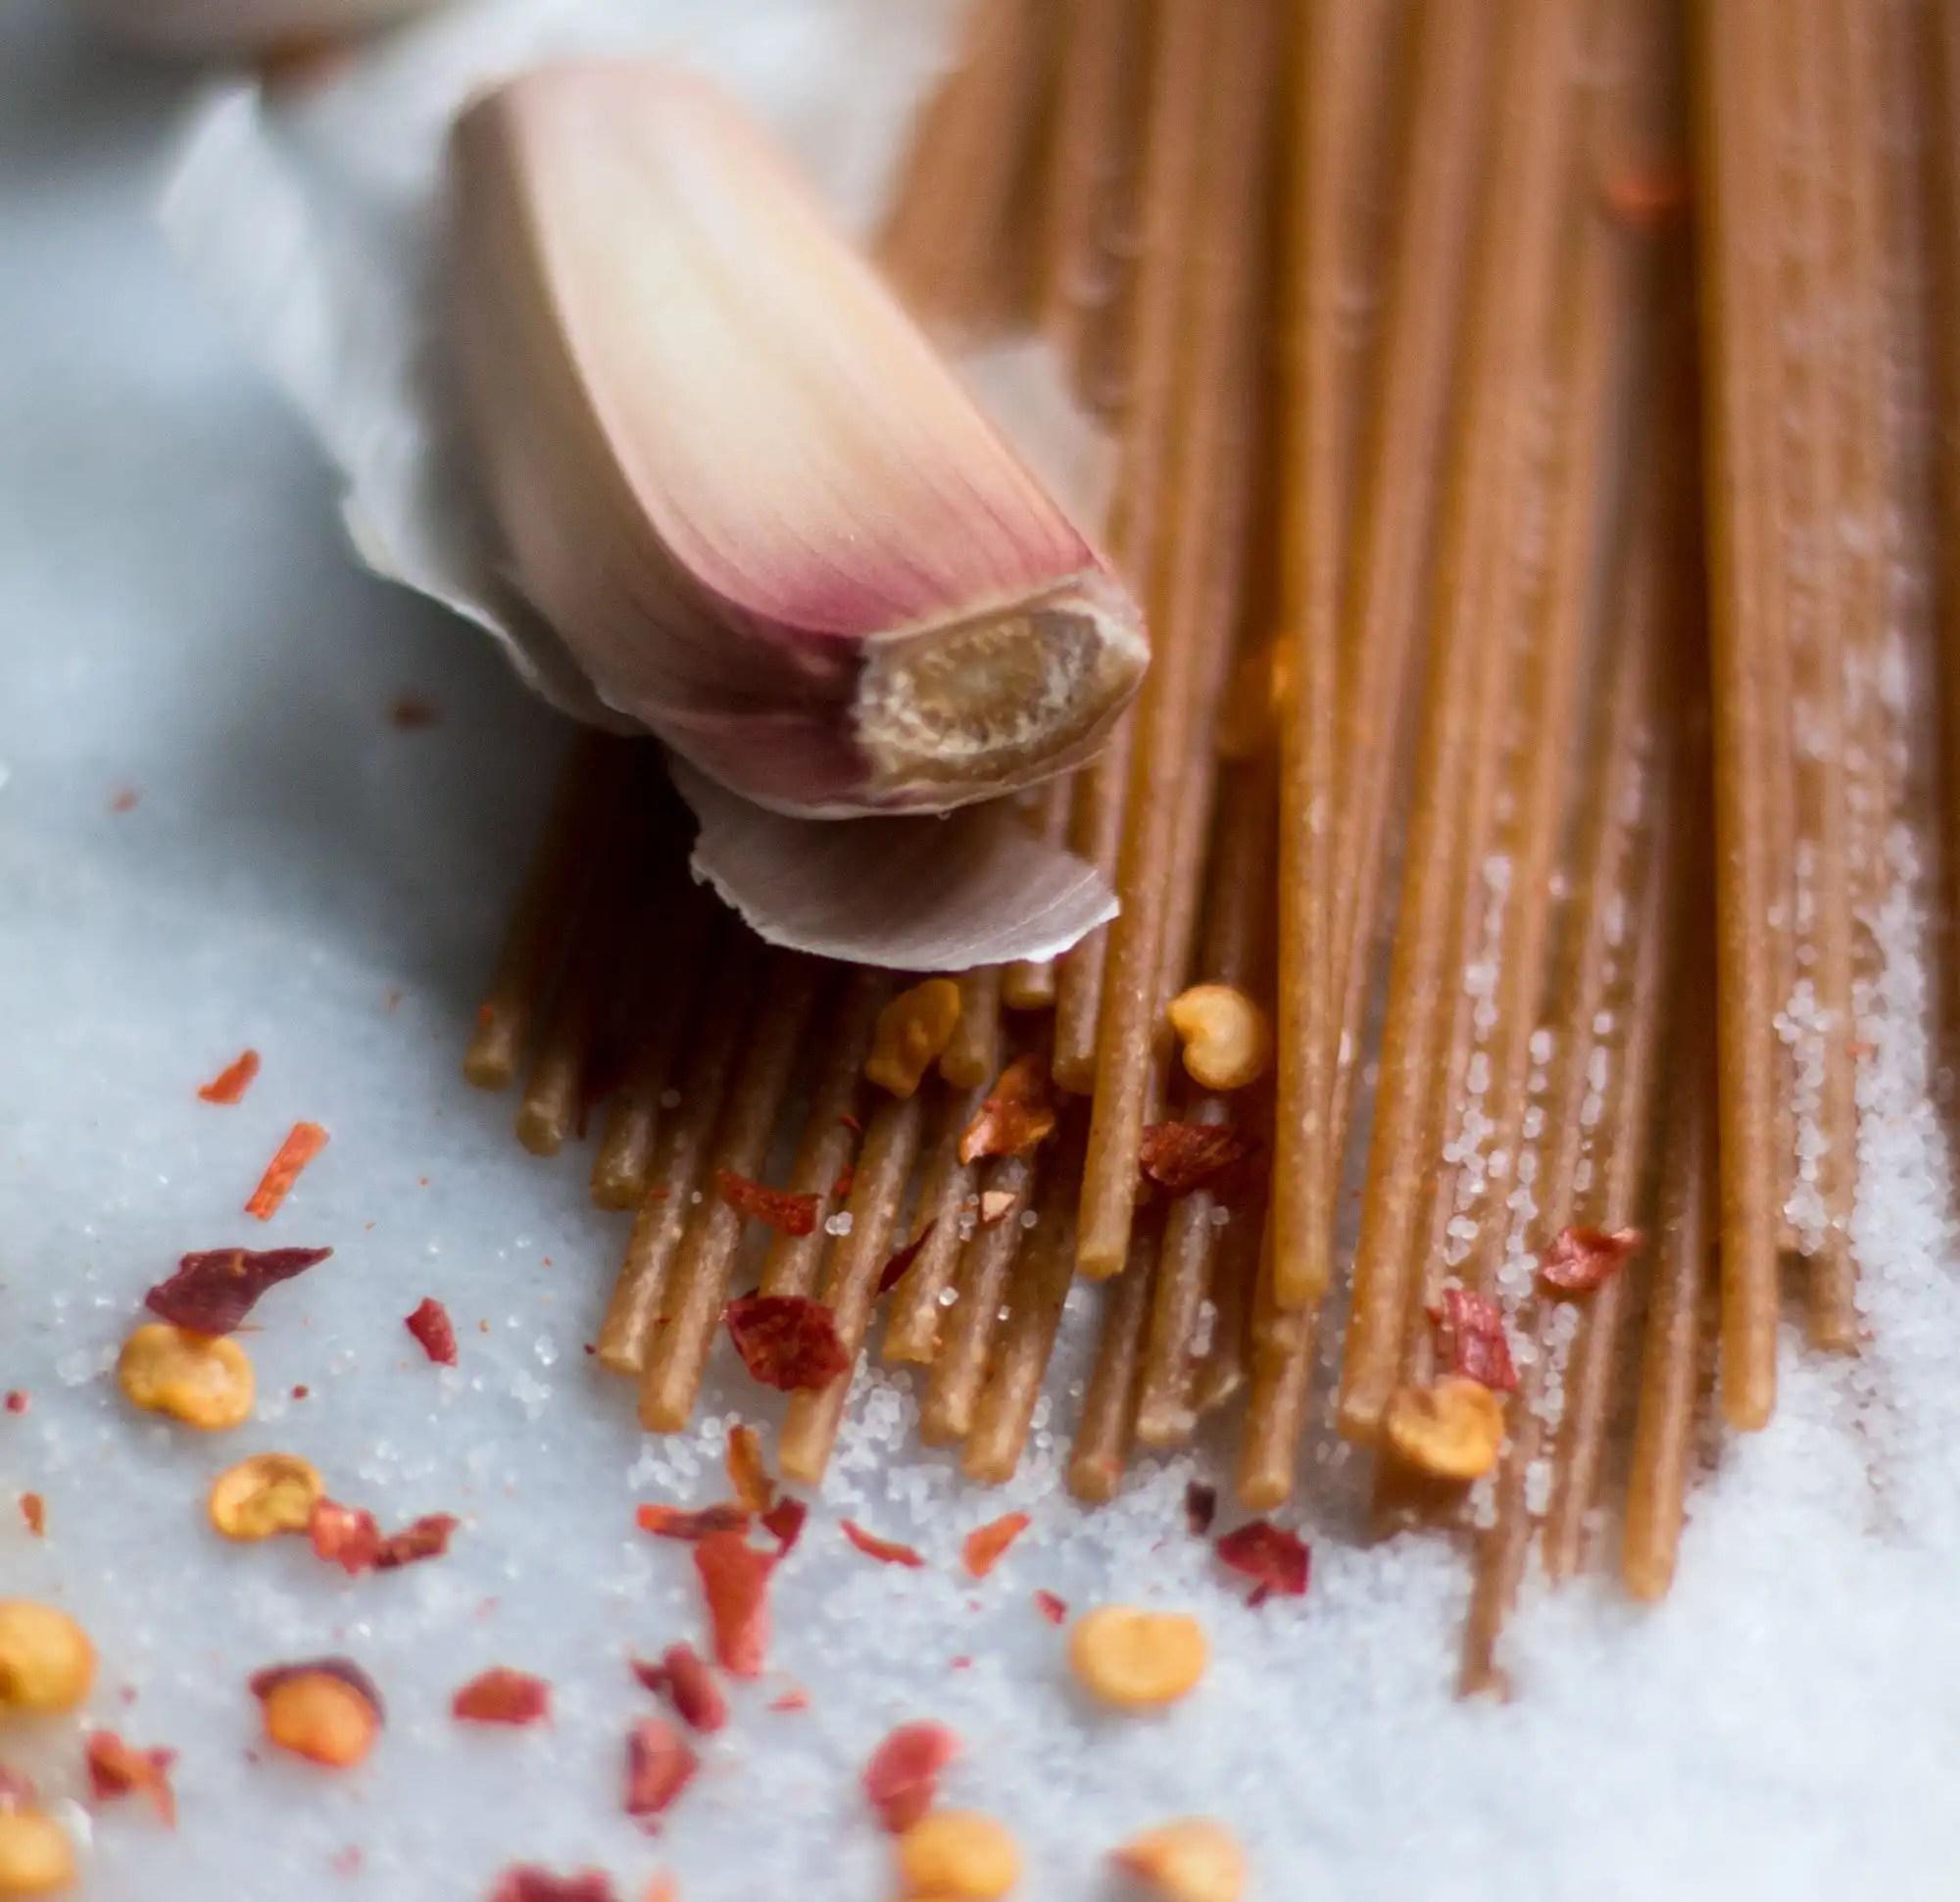 garlic, red pepper flakes, whole wheat spaghetti